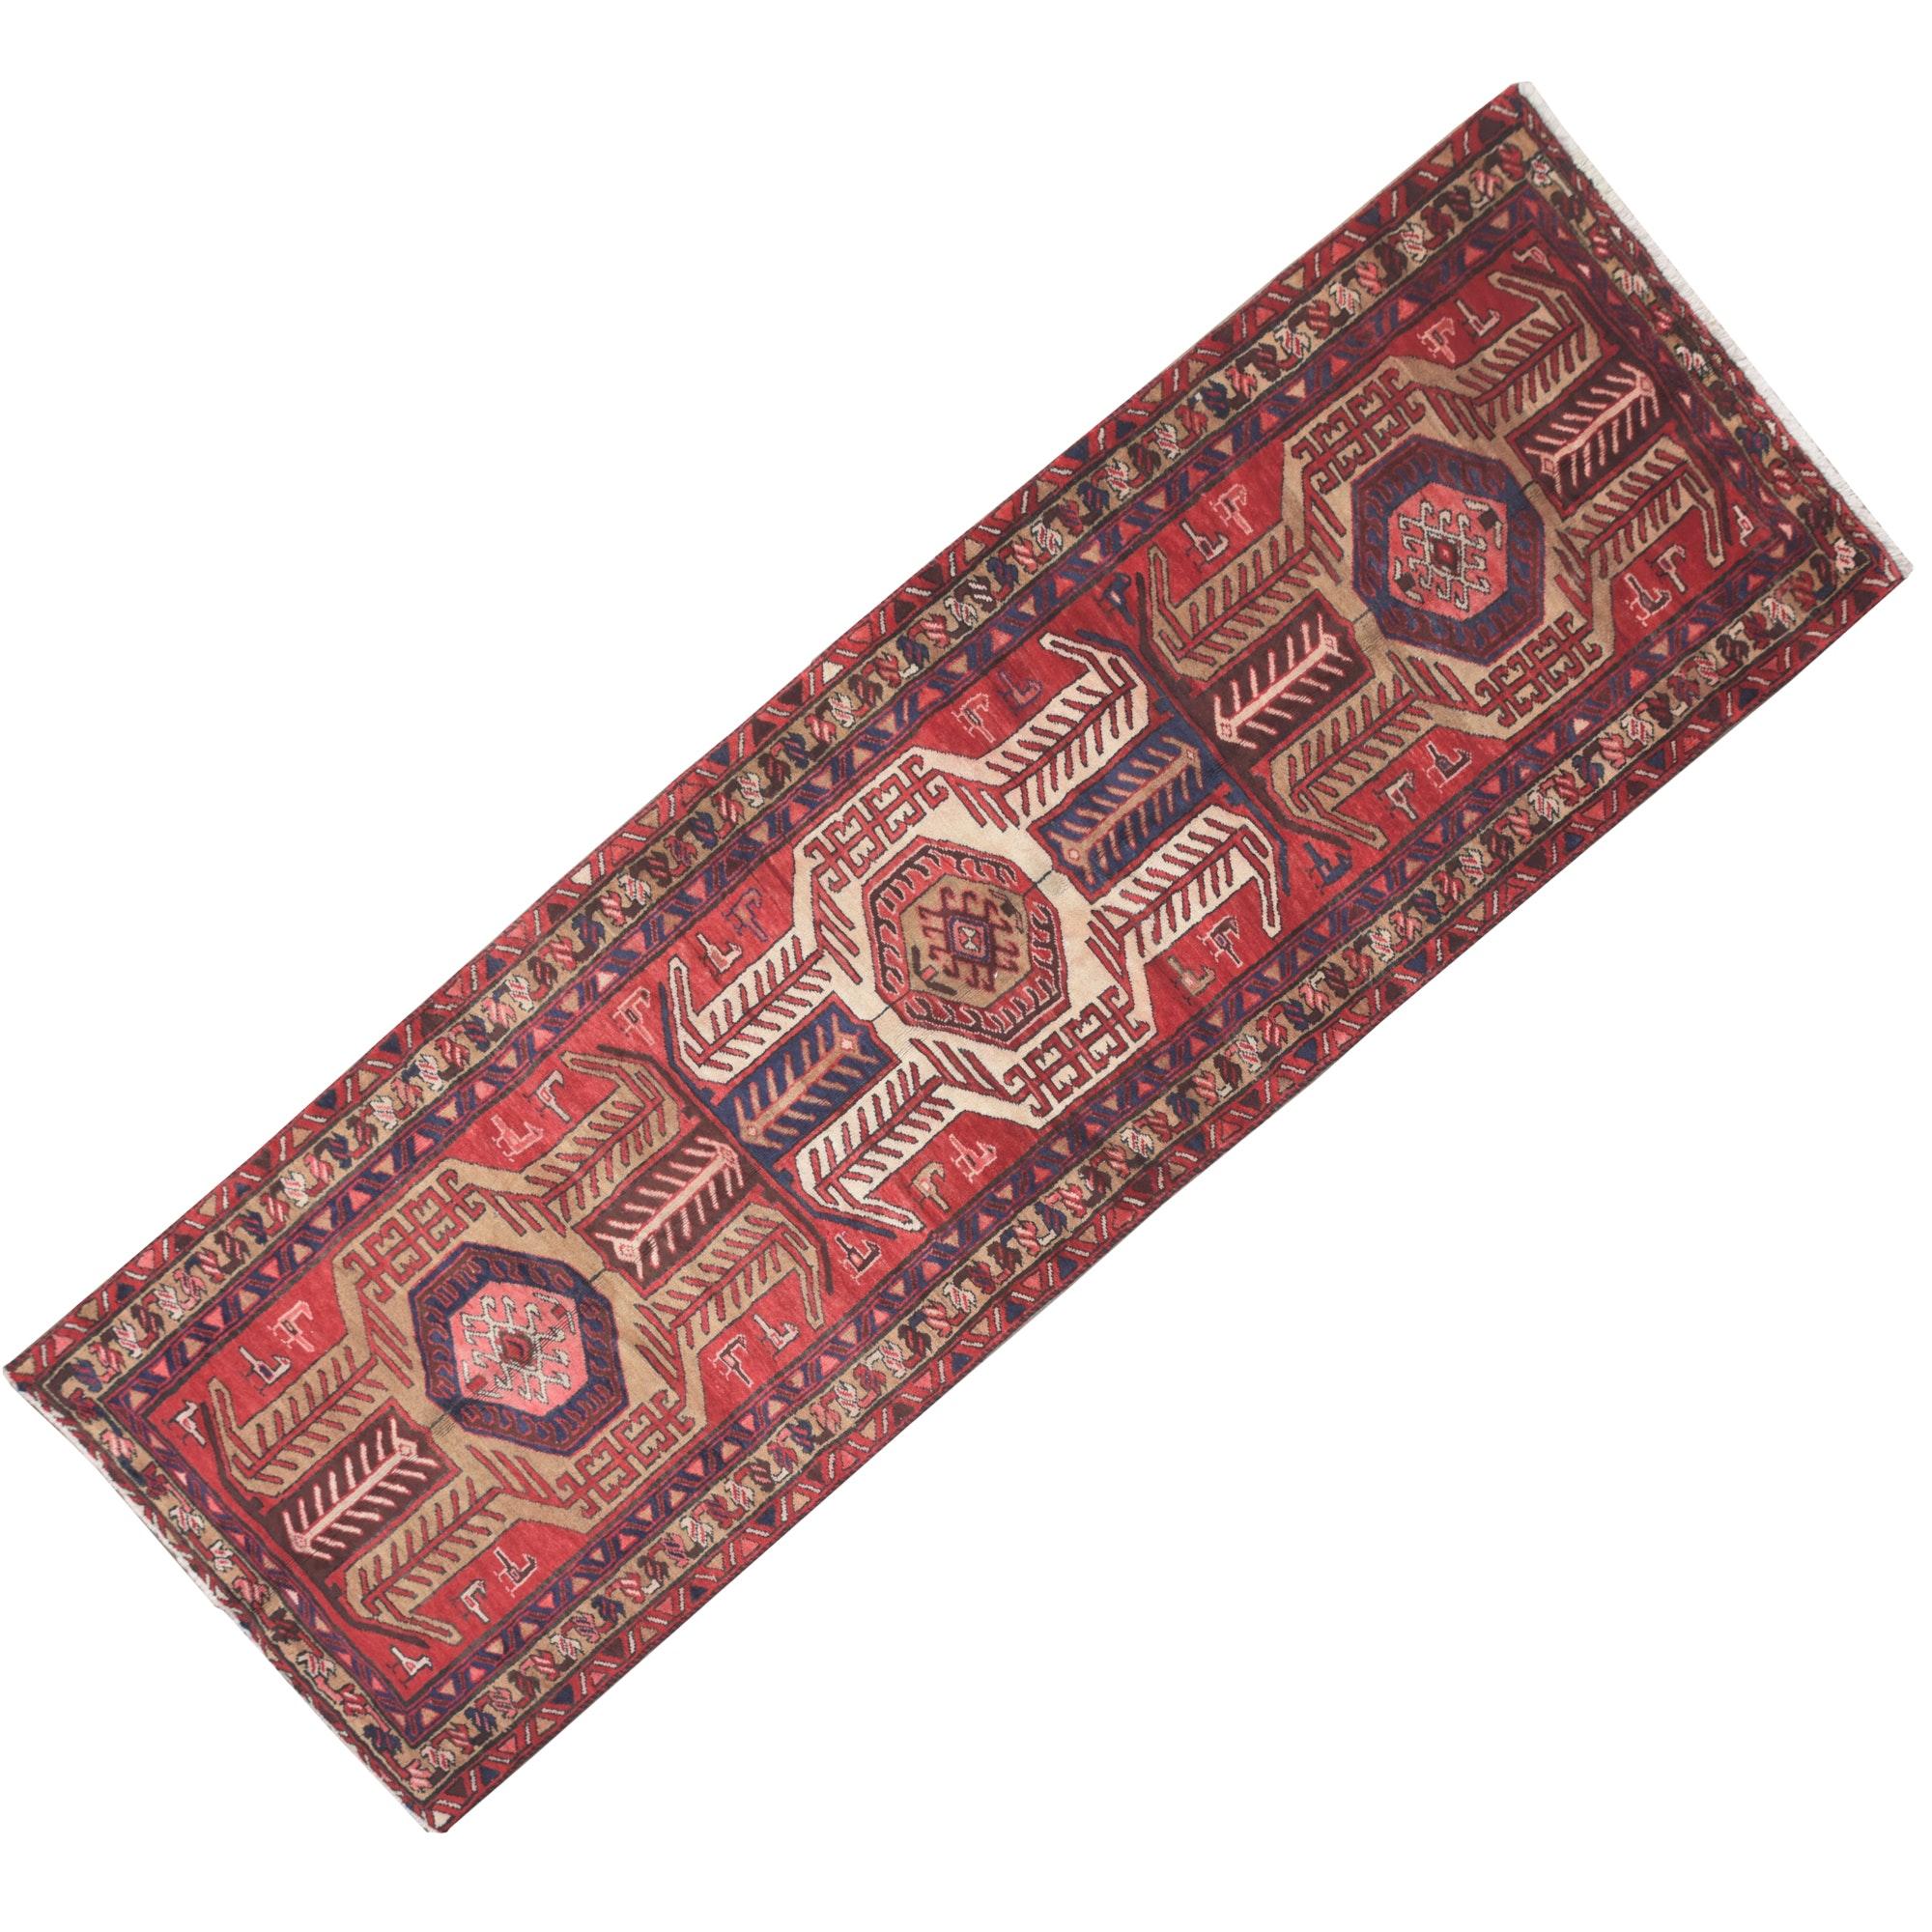 Hand-Knotted Caucasian Lenkoran Wool Carpet Runner